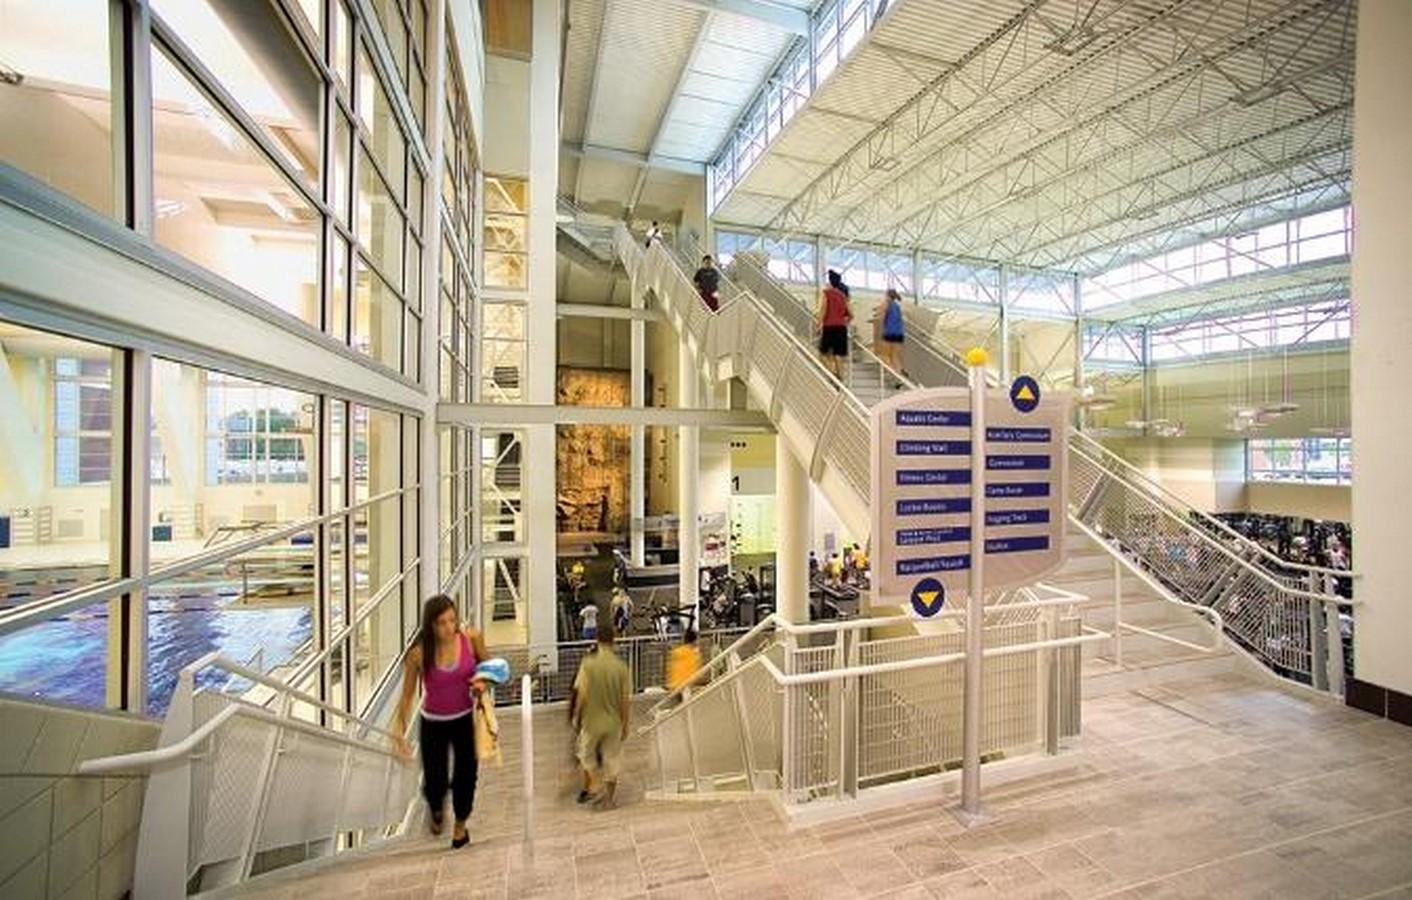 Campus Recreation Center, Georgia Institute of Technology- sheet3